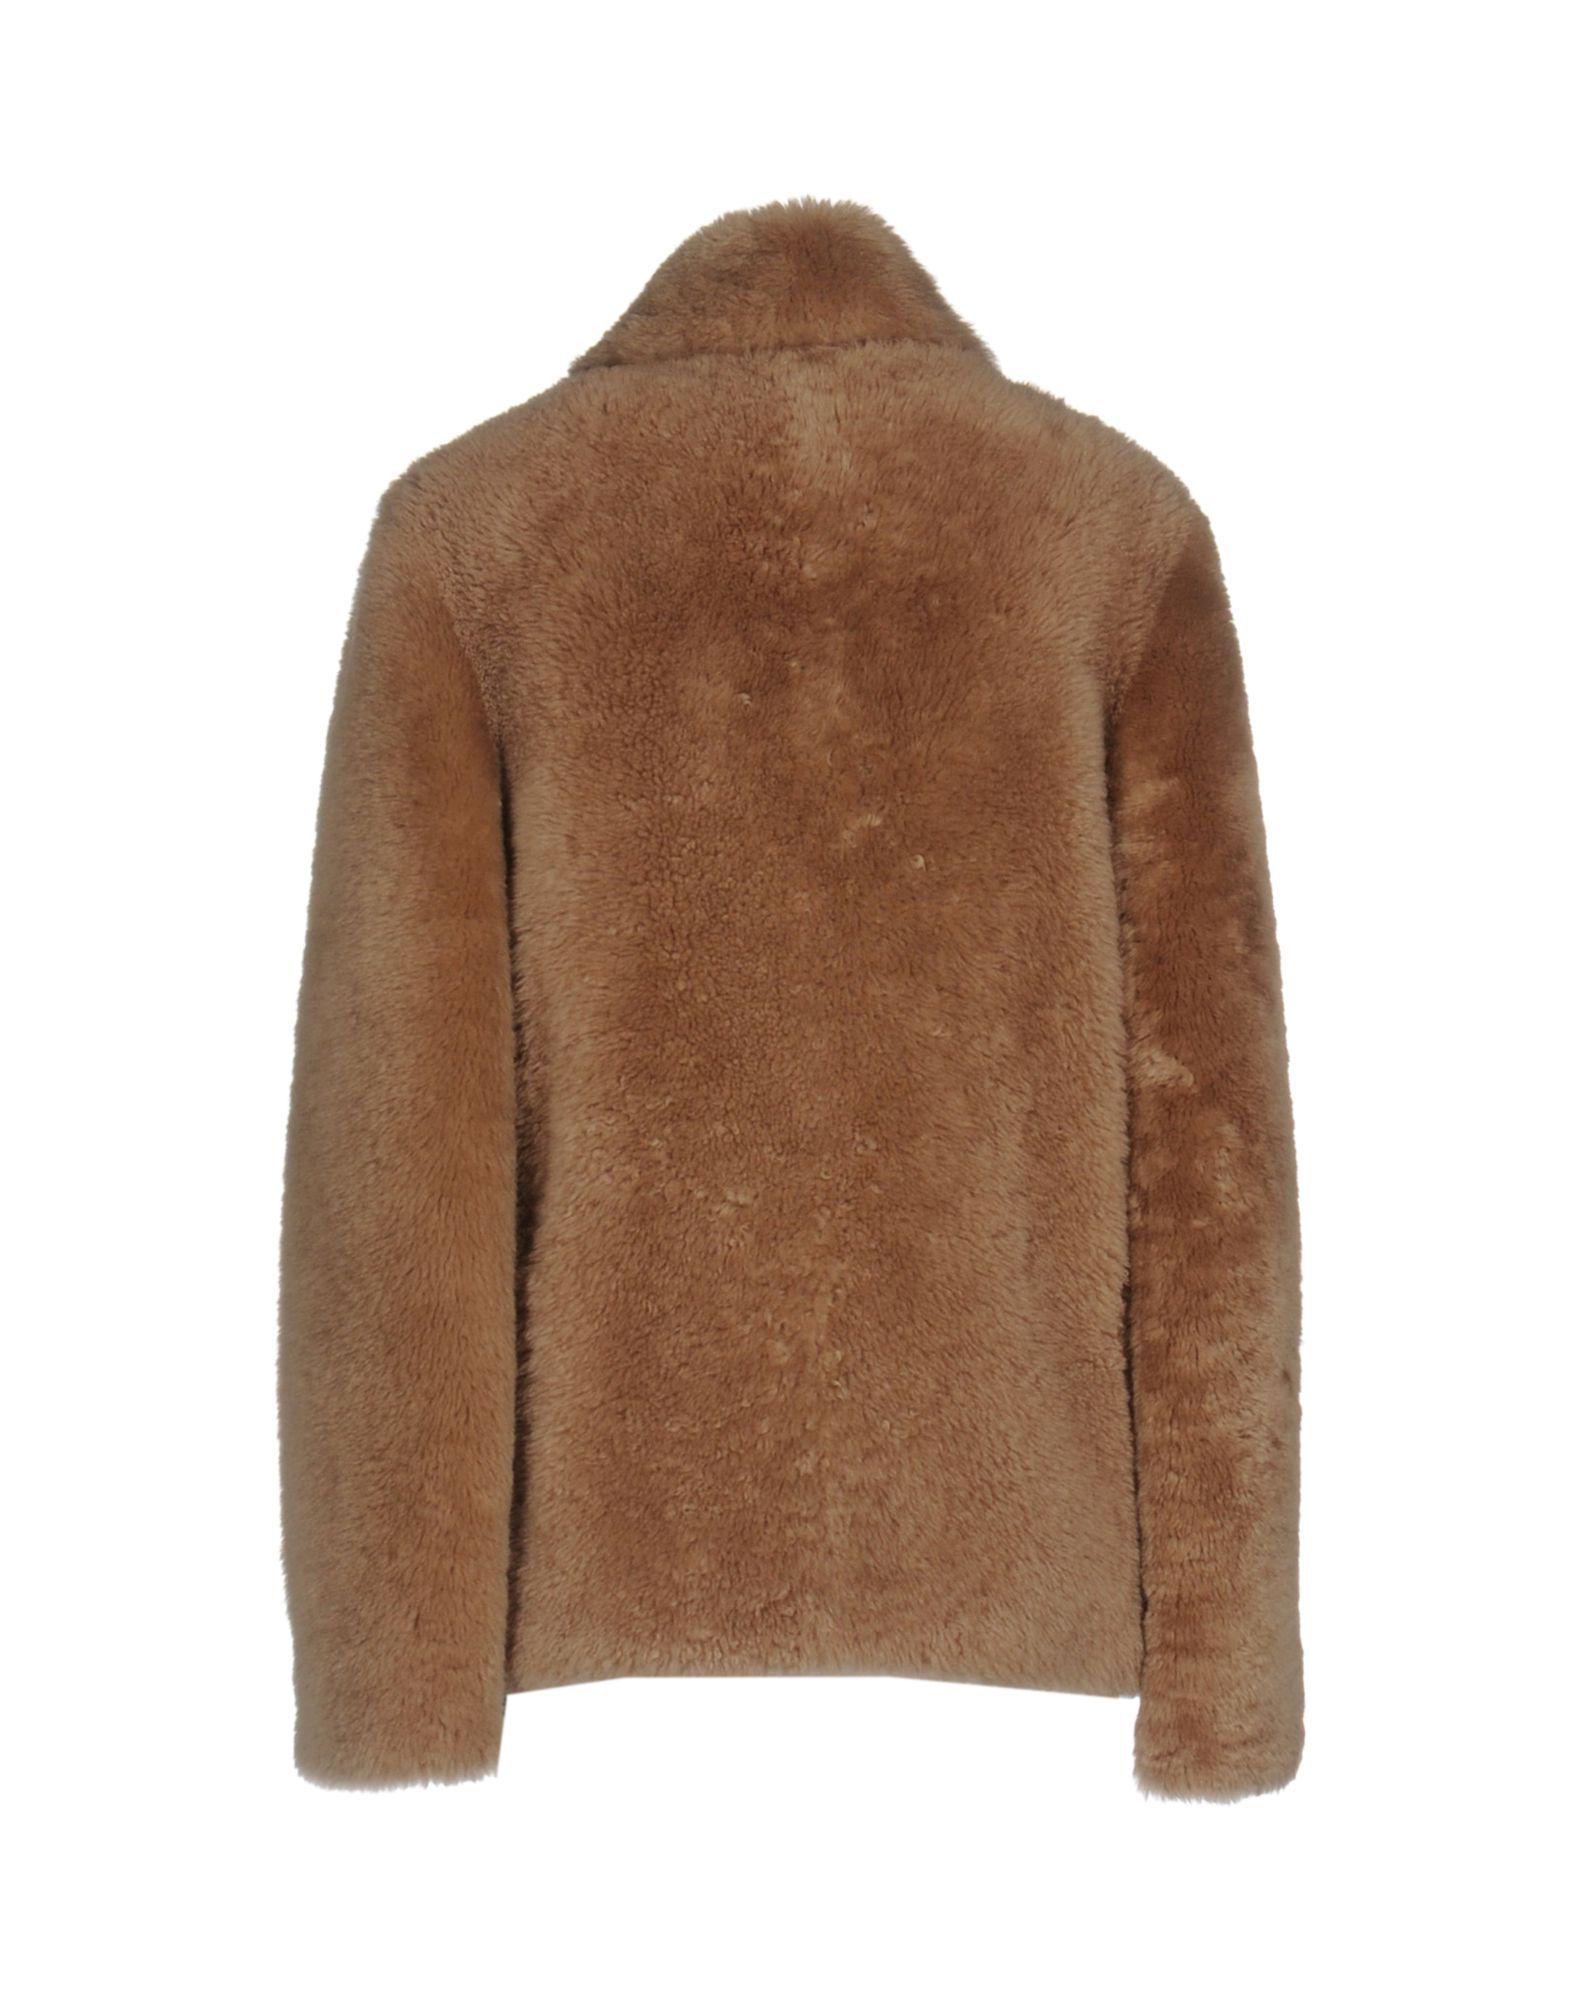 Balenciaga Camel Lambskin Leather Double Breasted Coat